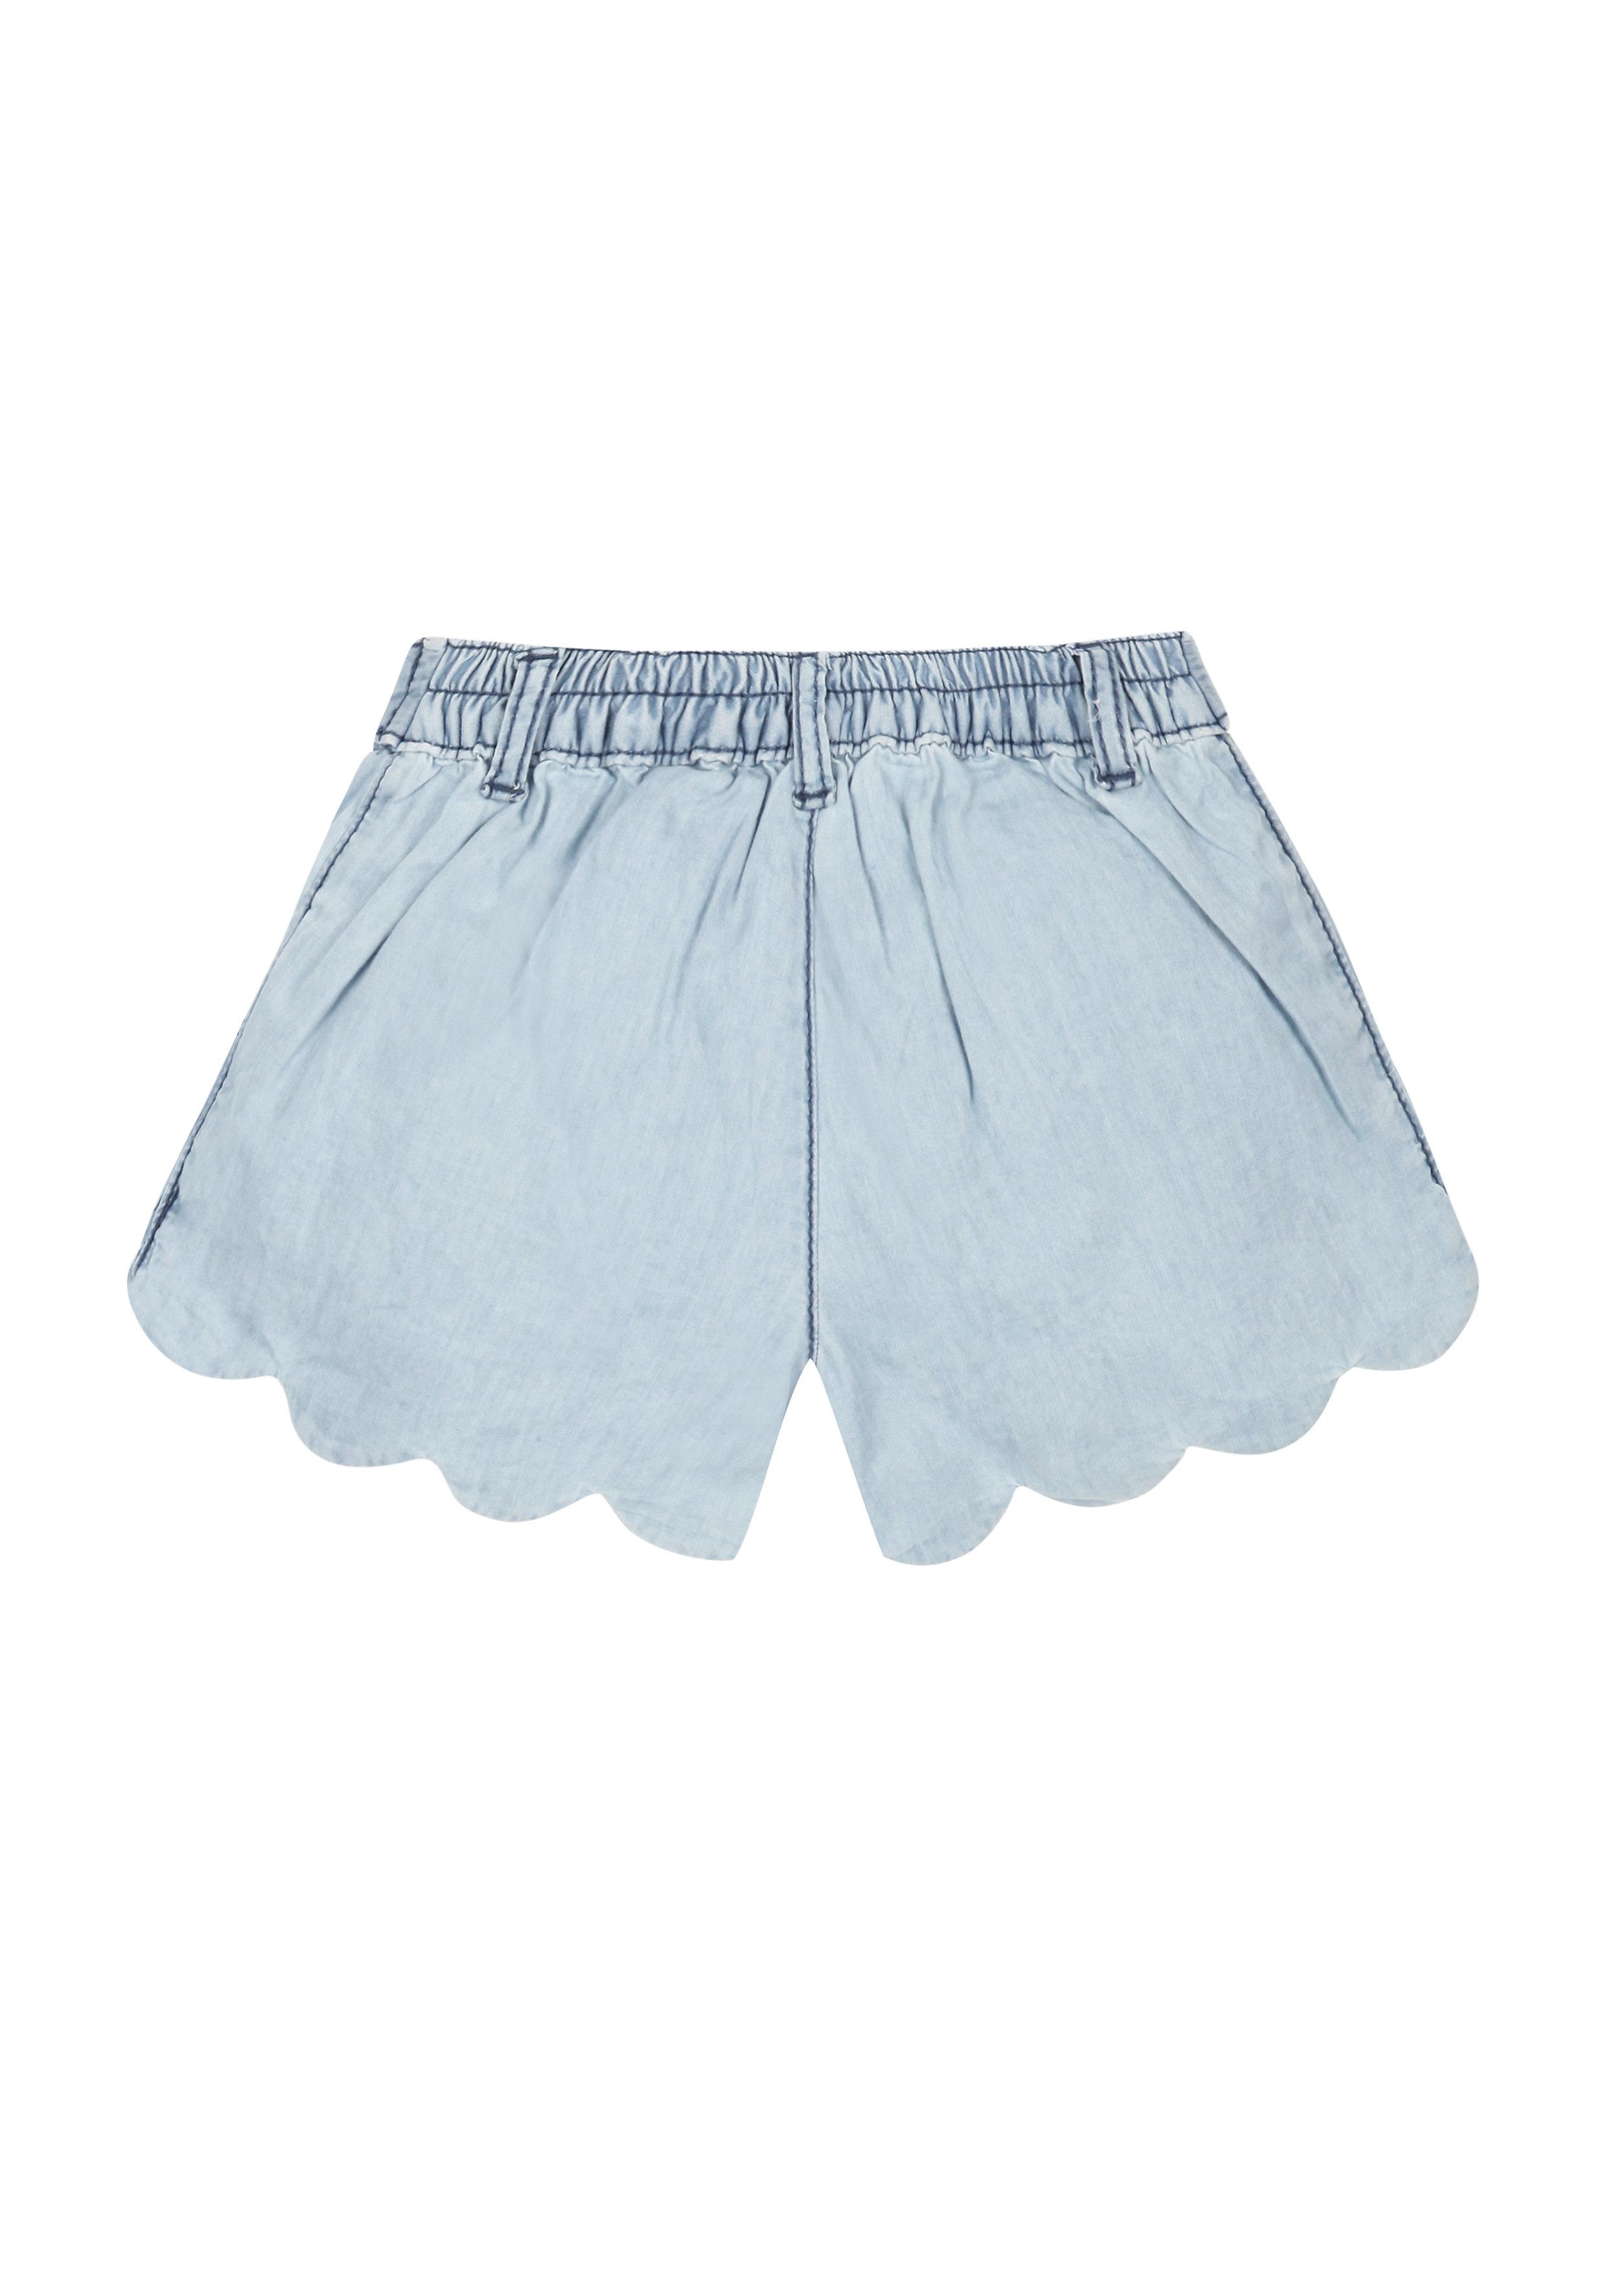 Mothercare | Girls Scalloped Chambray Shorts  - Denim